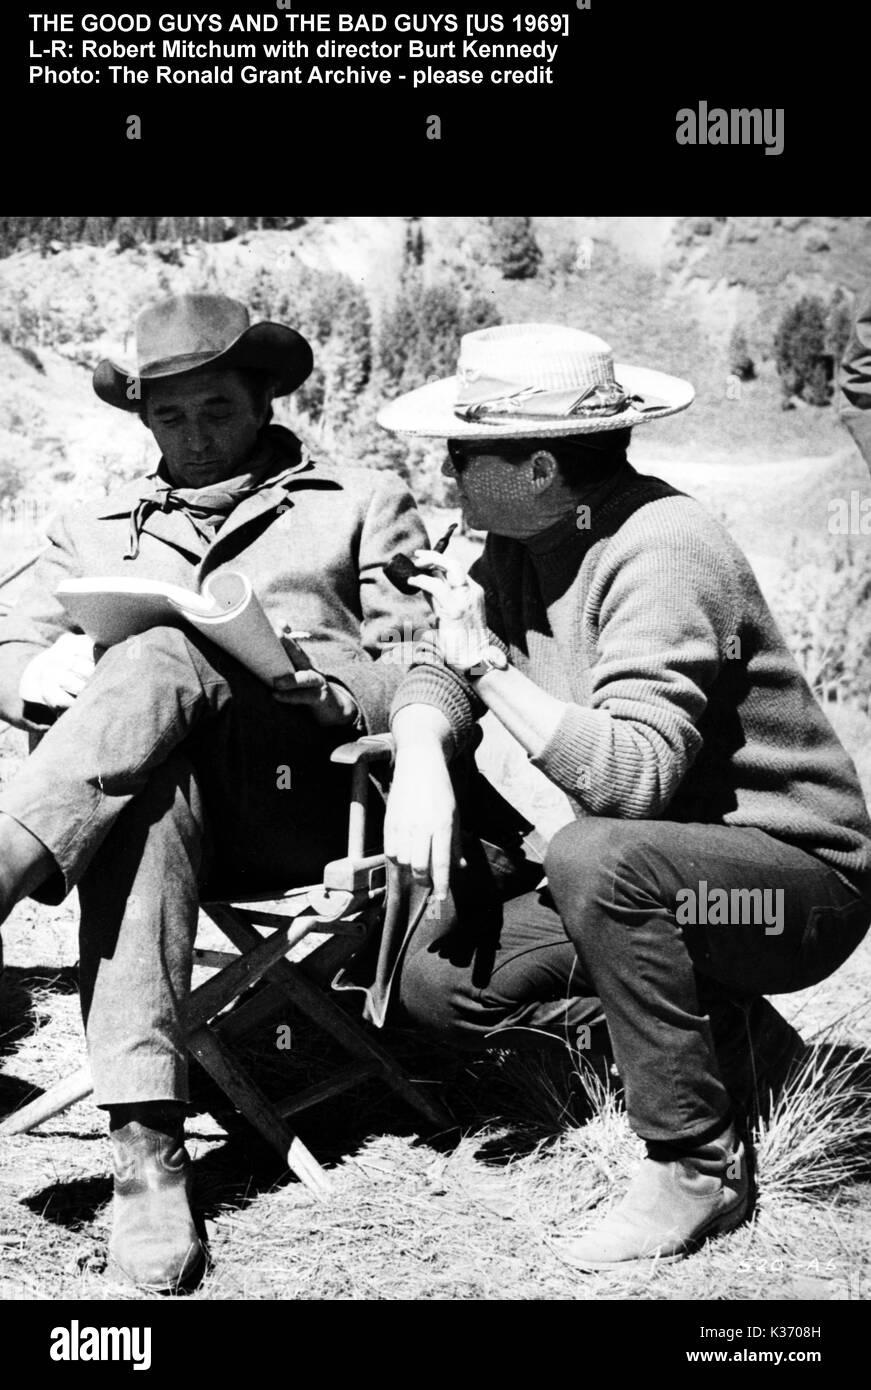 THE GOOD GUYS AND THE BAD GUYS L-R, ROBERT MITCHUM, director BURT KENNEDY - Stock Image